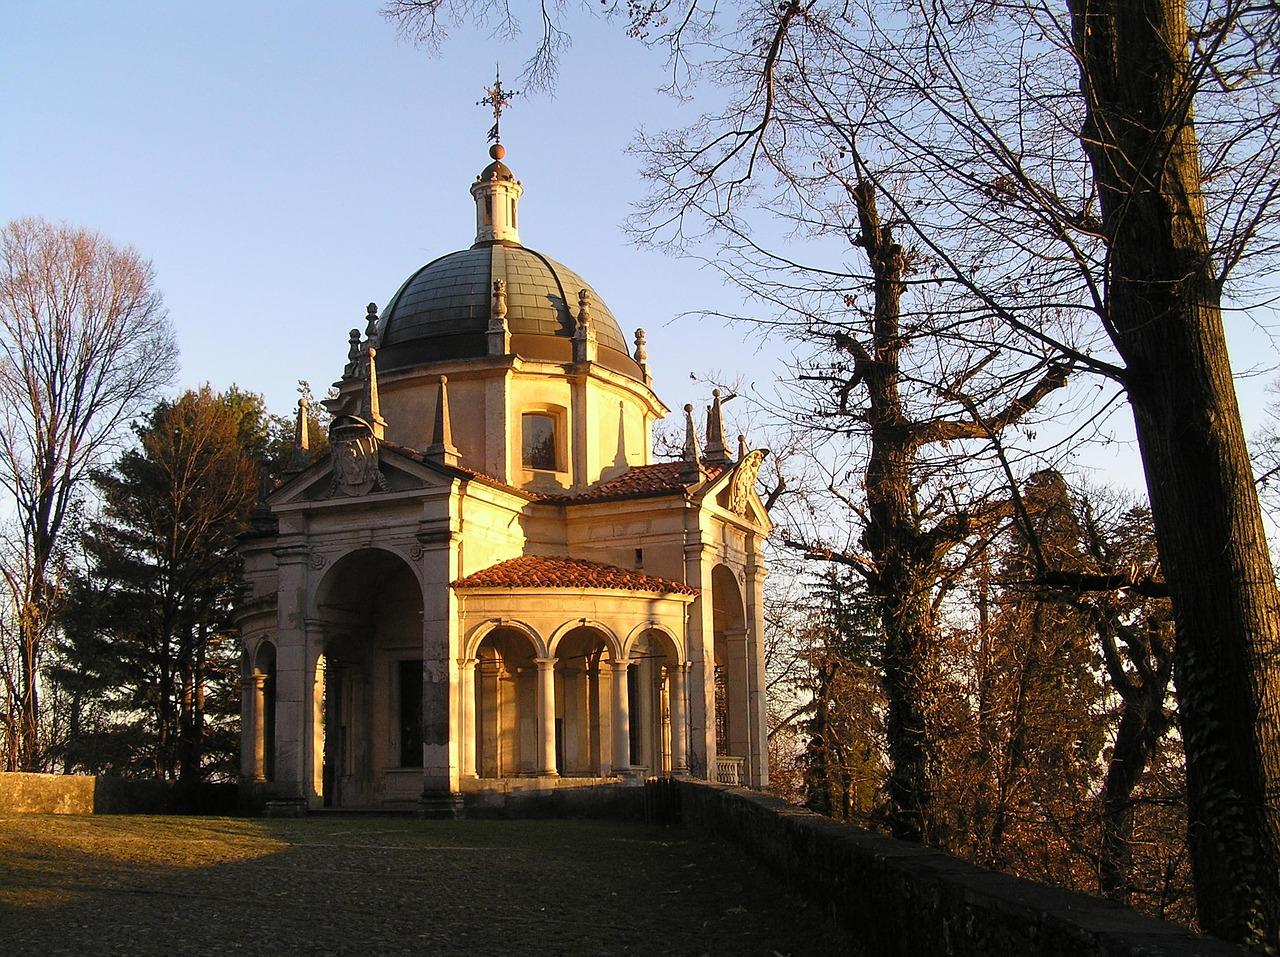 Sacromonte in Varese, Italy